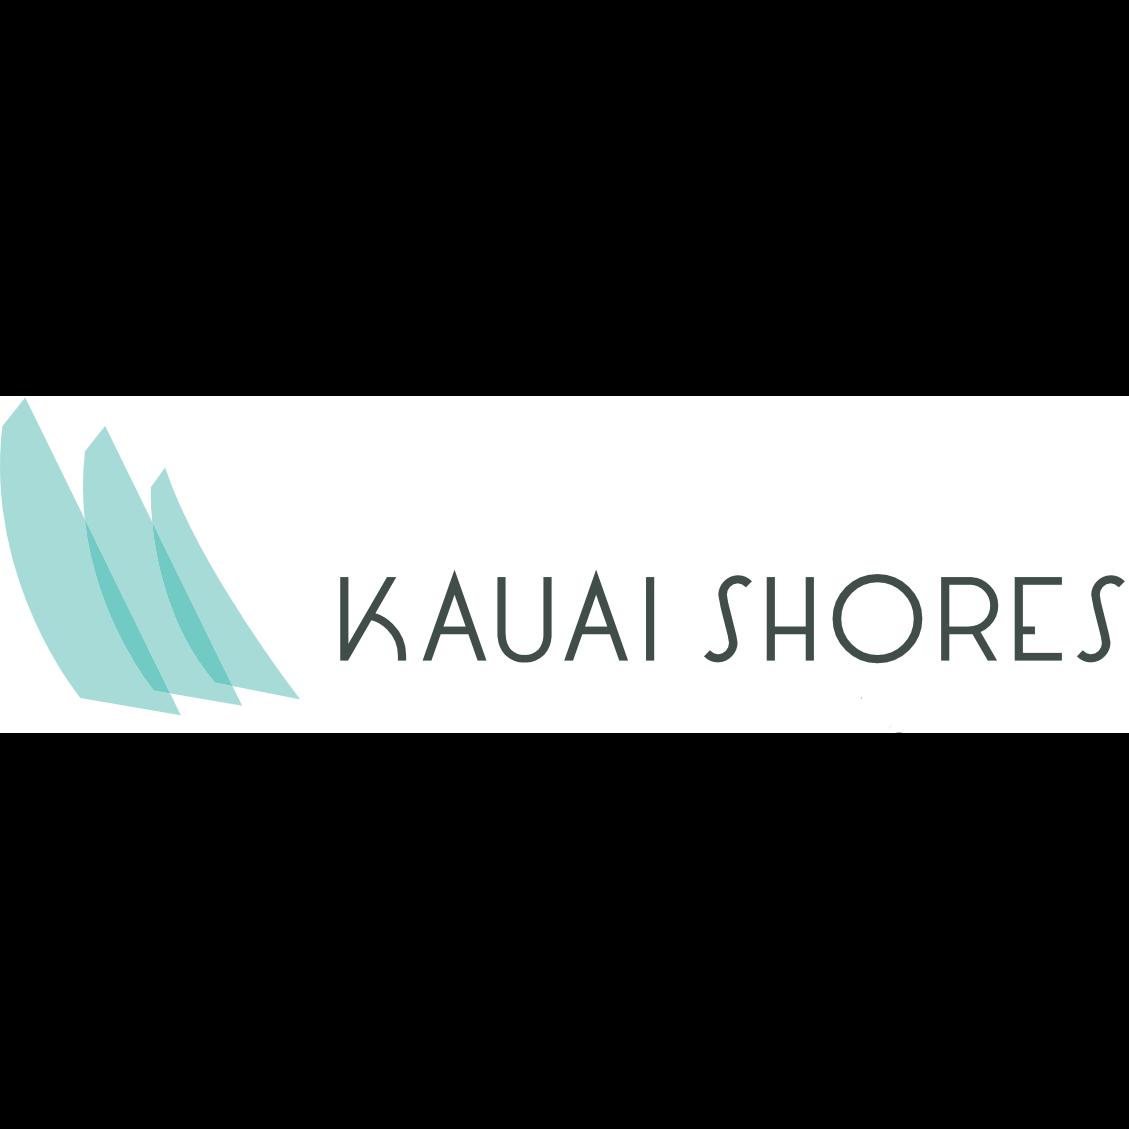 Kauai Shores Hotel image 10